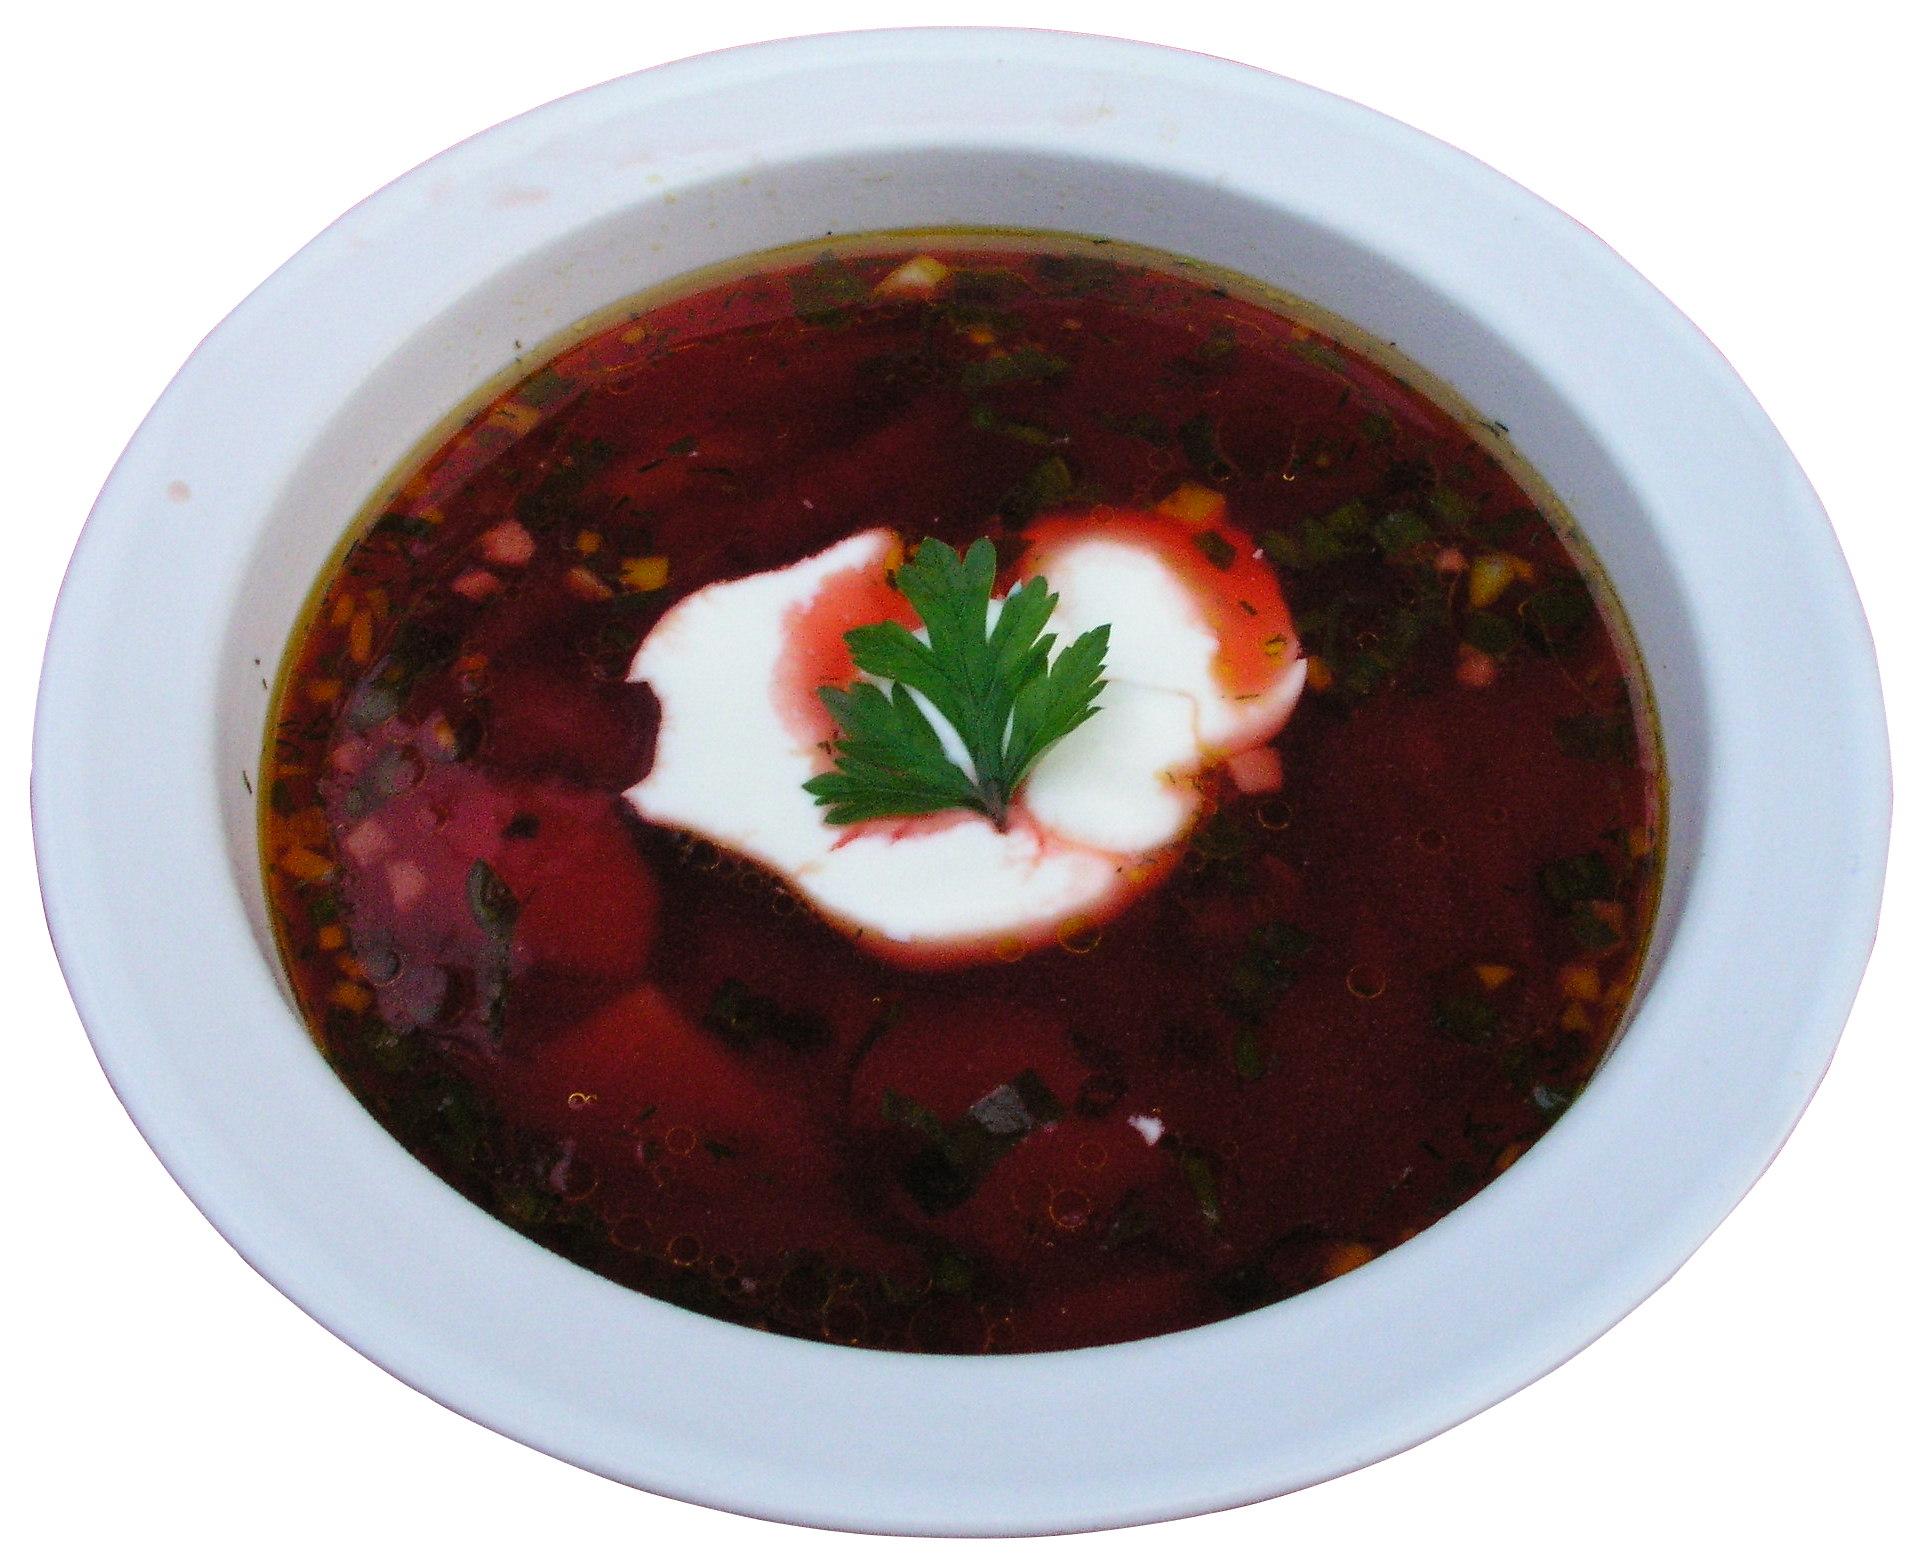 File:Ukranian borscht.jpg - Wikimedia Commons